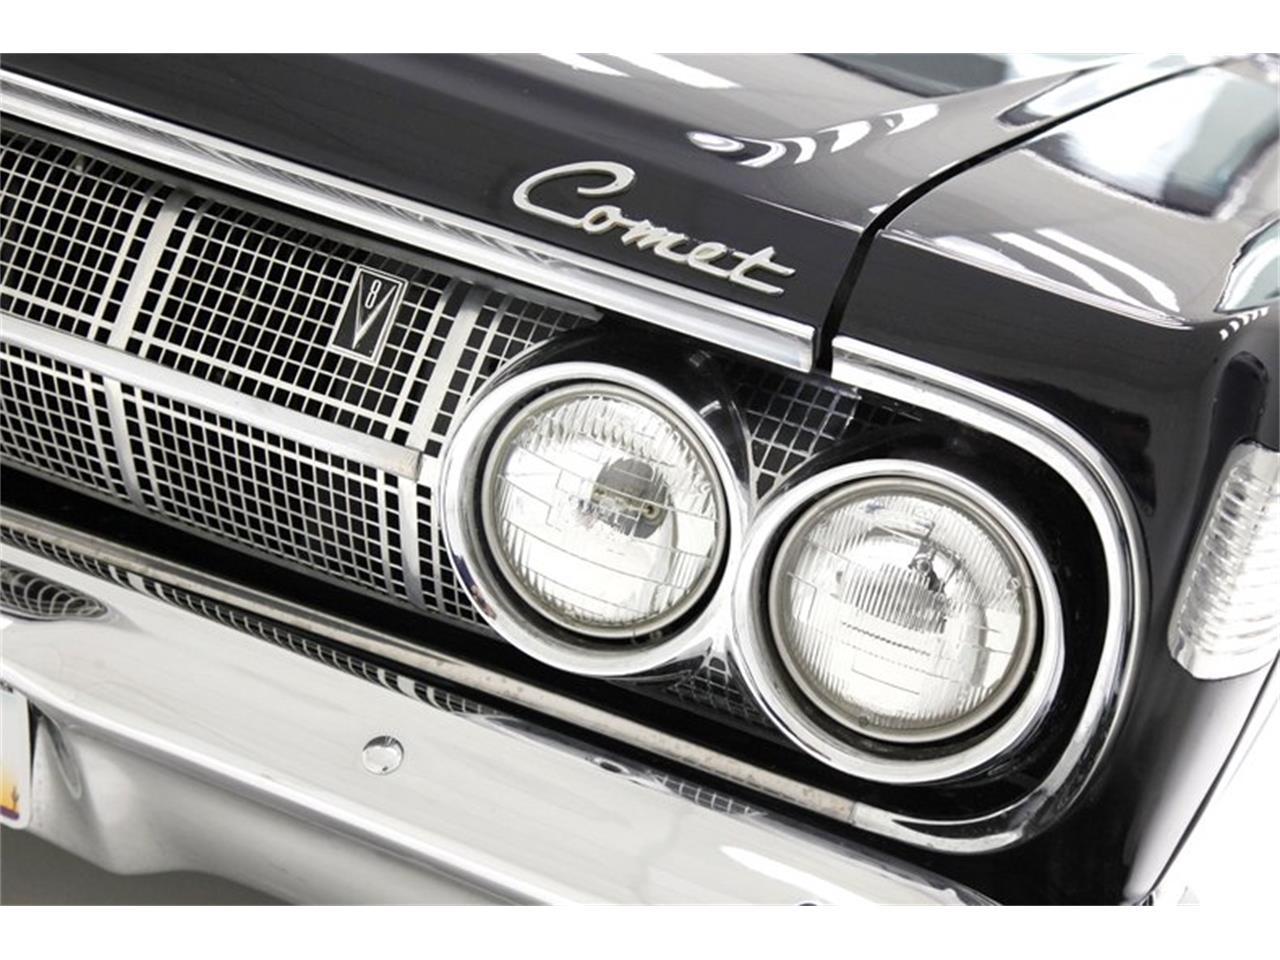 1964 Mercury Comet (CC-1415700) for sale in Morgantown, Pennsylvania